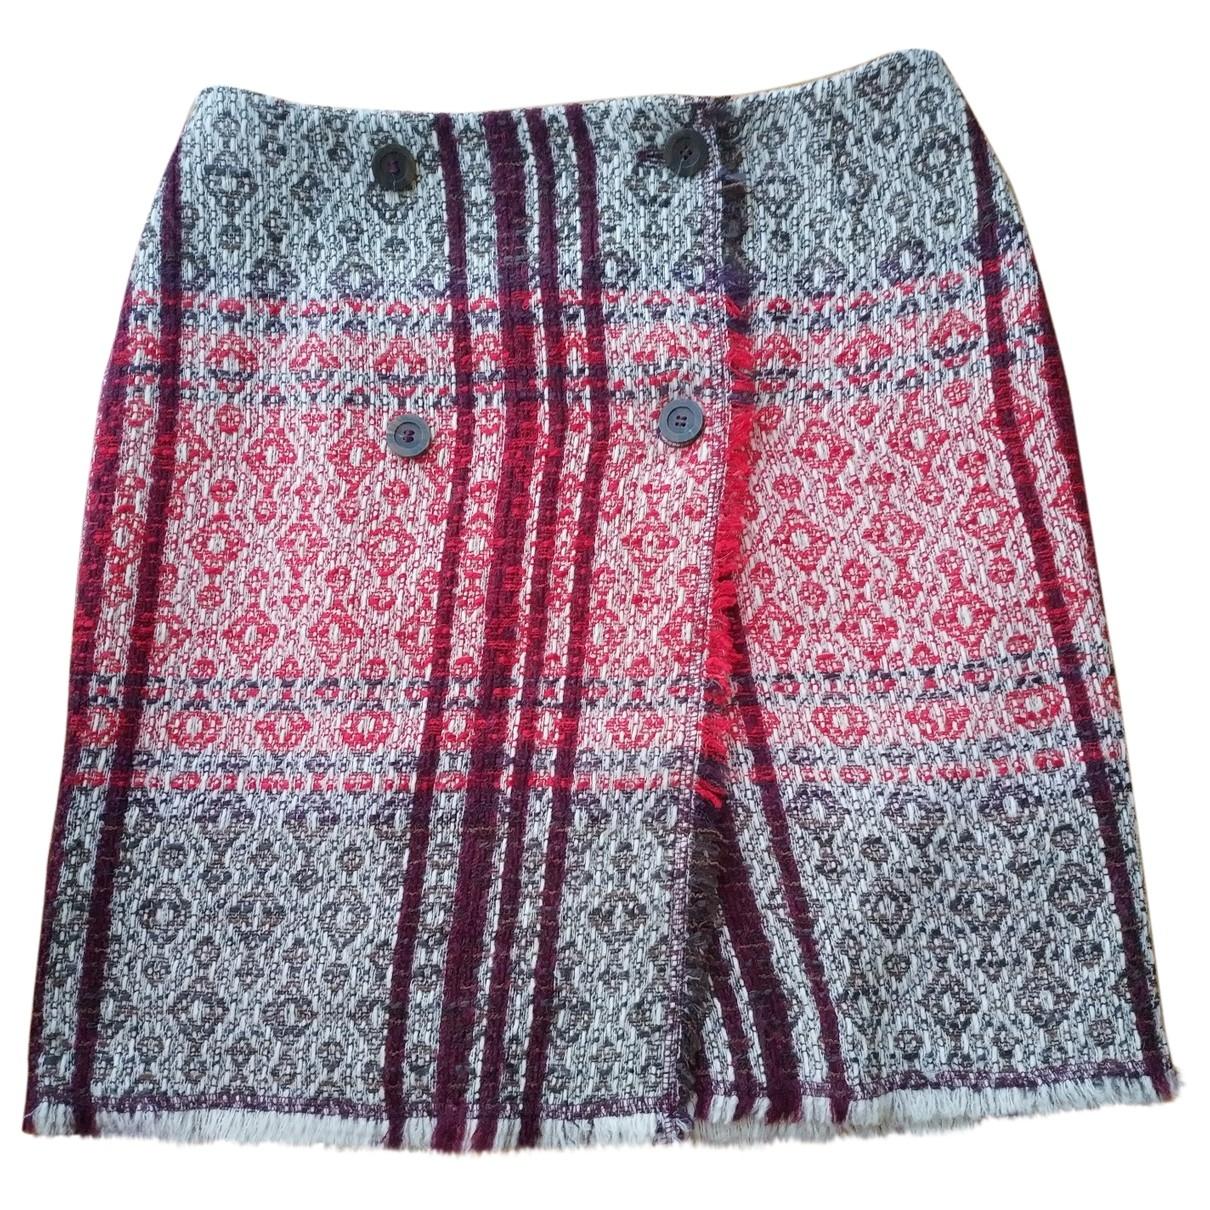 Escada \N Multicolour Wool skirt for Women 36 FR